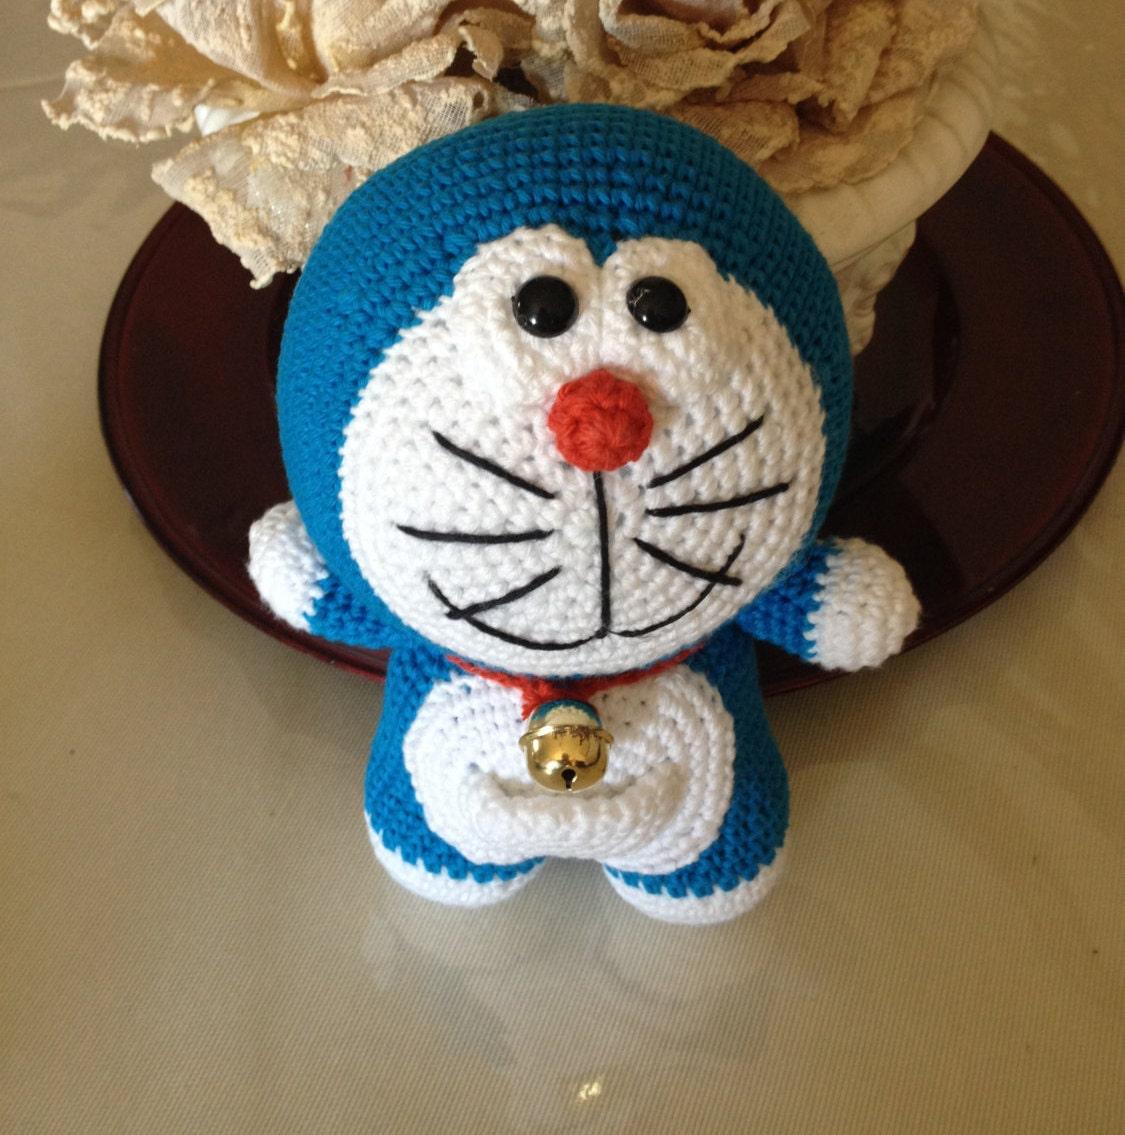 Amigurumi Doraemon Tutorial : Doraemon amigurumi Doraemon bambola animale cartoon by ...